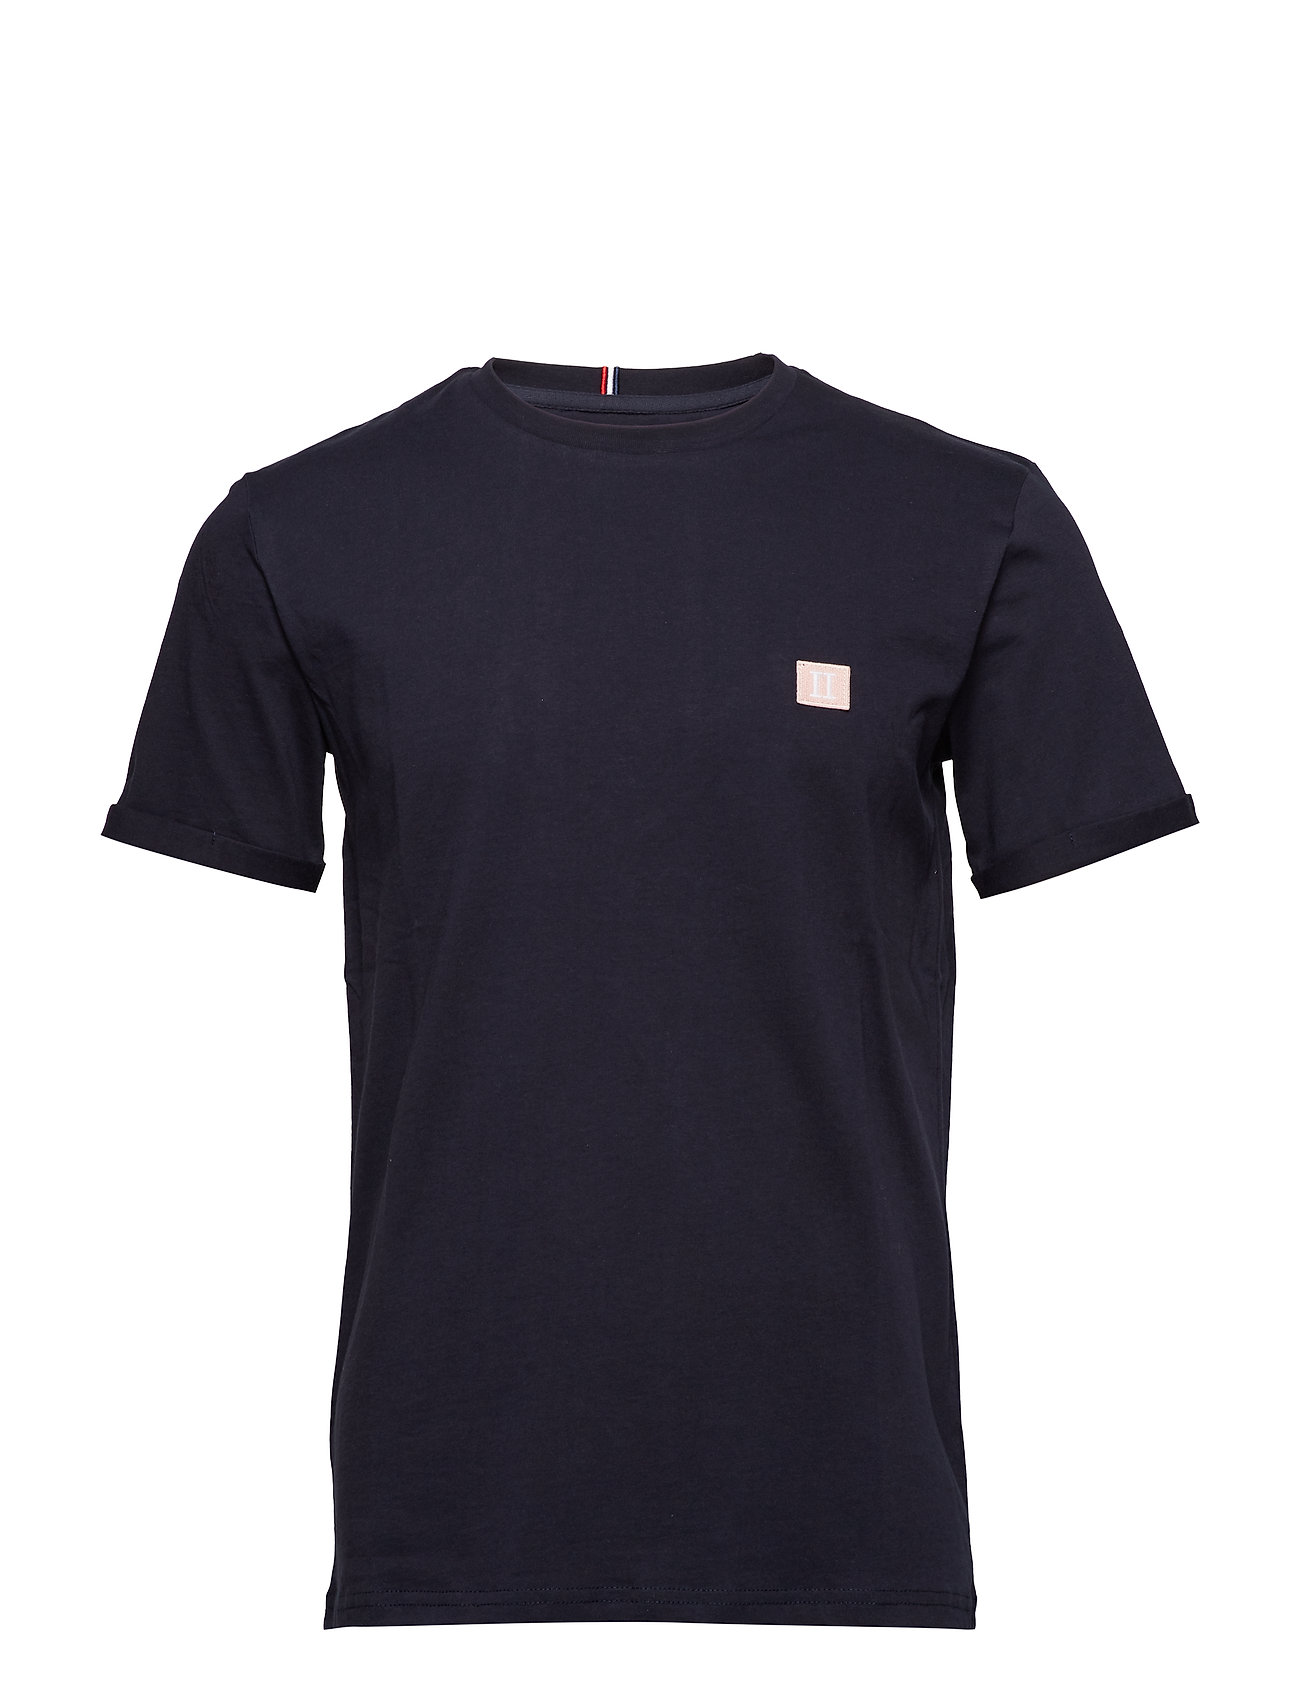 Image of Piece T-Shirt (3119382151)